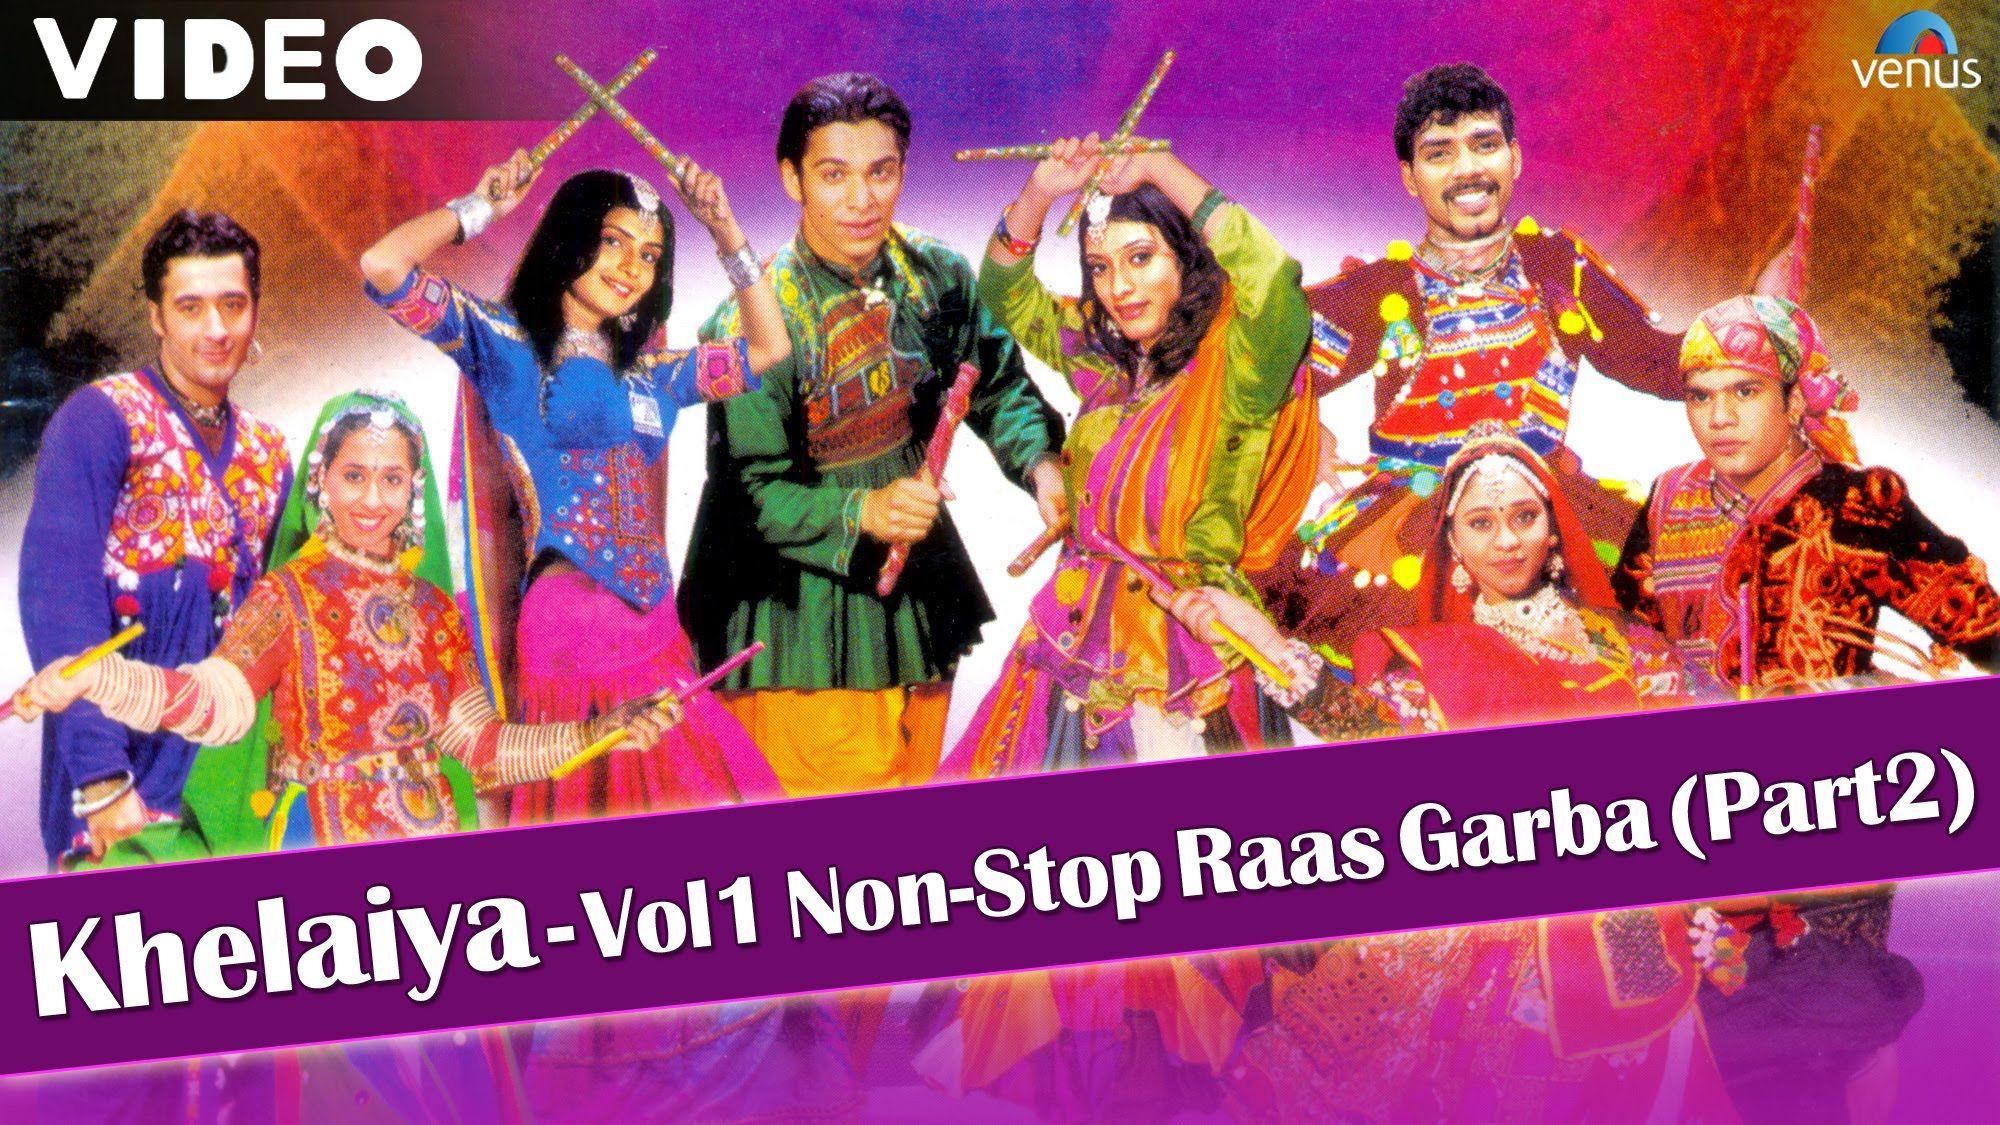 Khelaiya Vol 1 Non Stop Raas Garba Part 2 New Gujarati Dandiya Songs Garba Songs Navratri Songs Gujarati Garba Songs